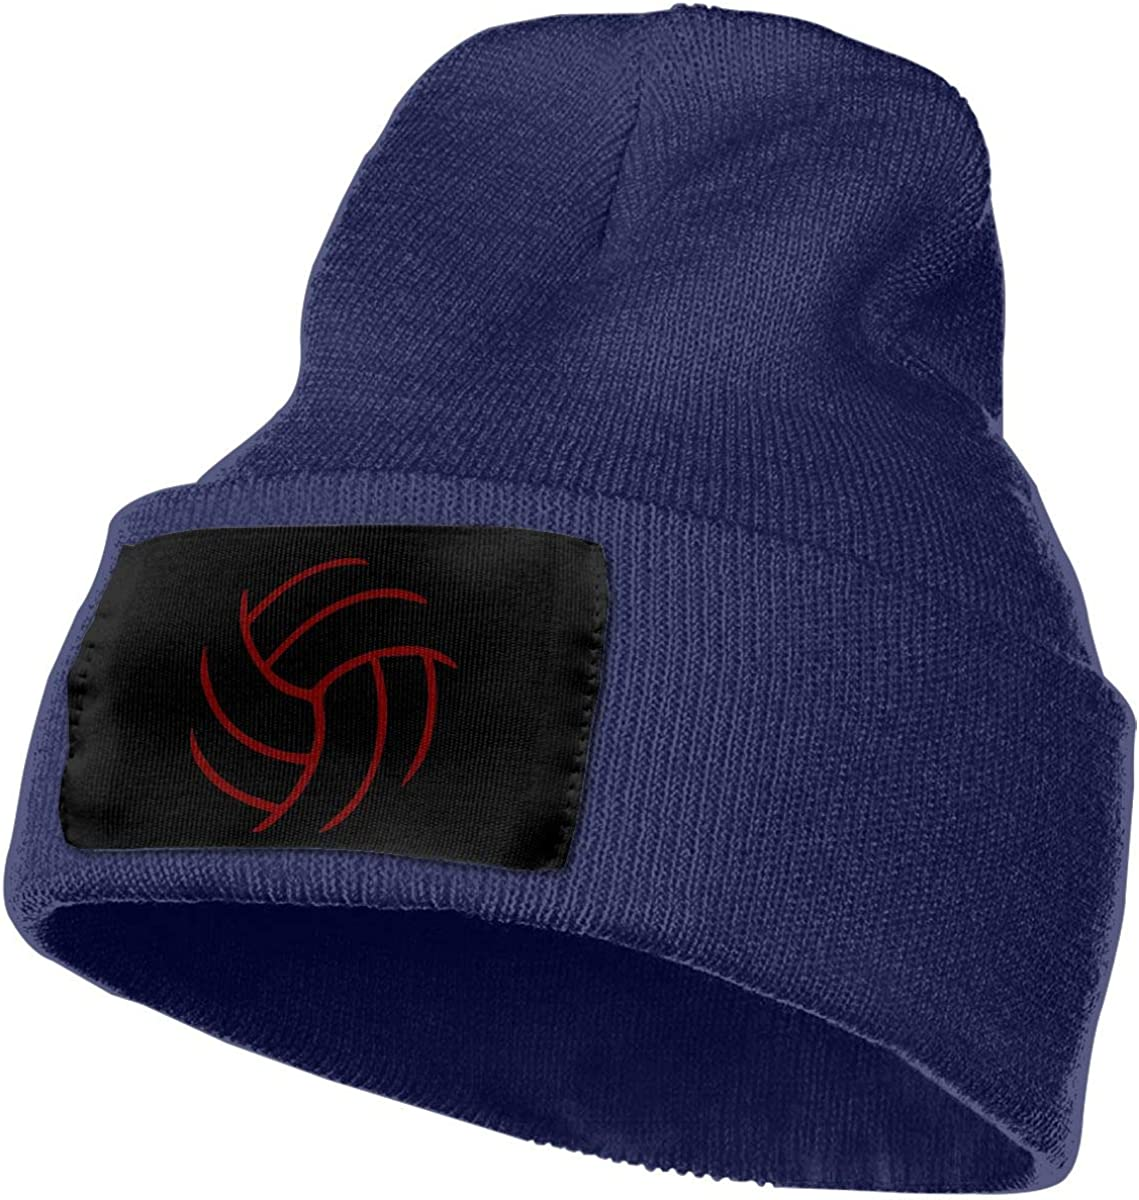 COLLJL-8 Men//Women Volleyball Outdoor Fashion Knit Beanies Hat Soft Winter Skull Caps